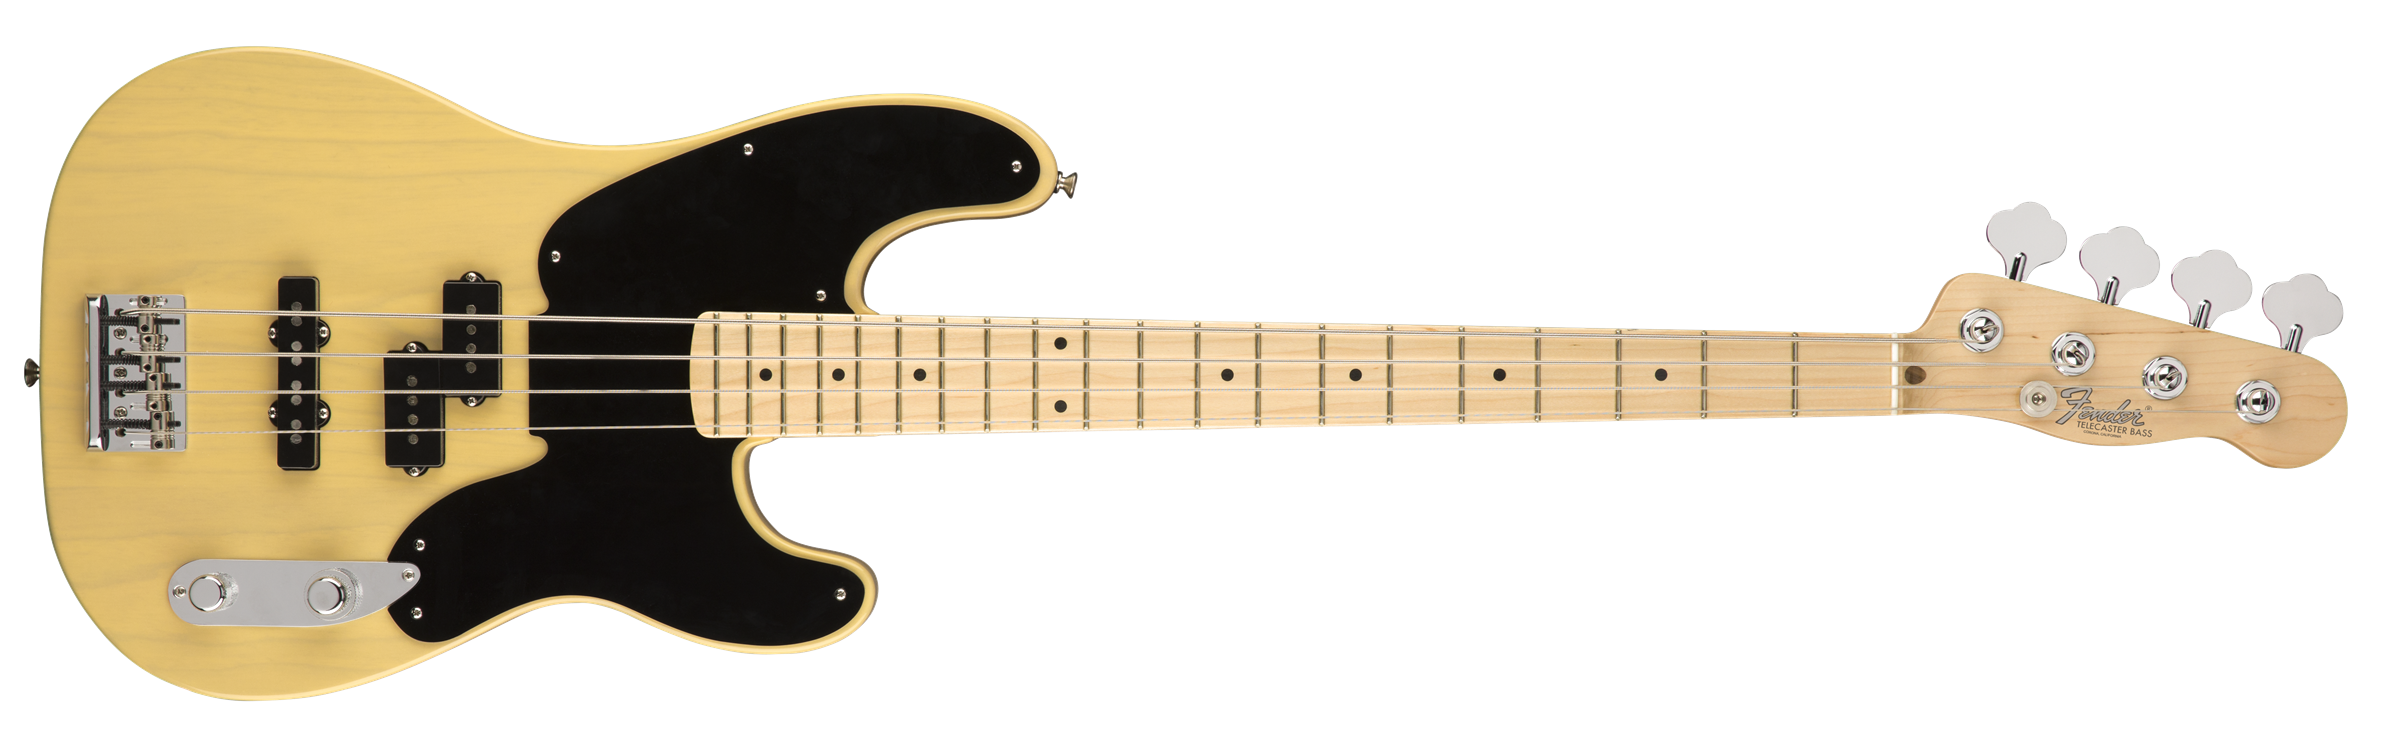 FENDER 2018 Limited Edition 51 Telecaster PJ Bass, Maple Fingerboard, BGB